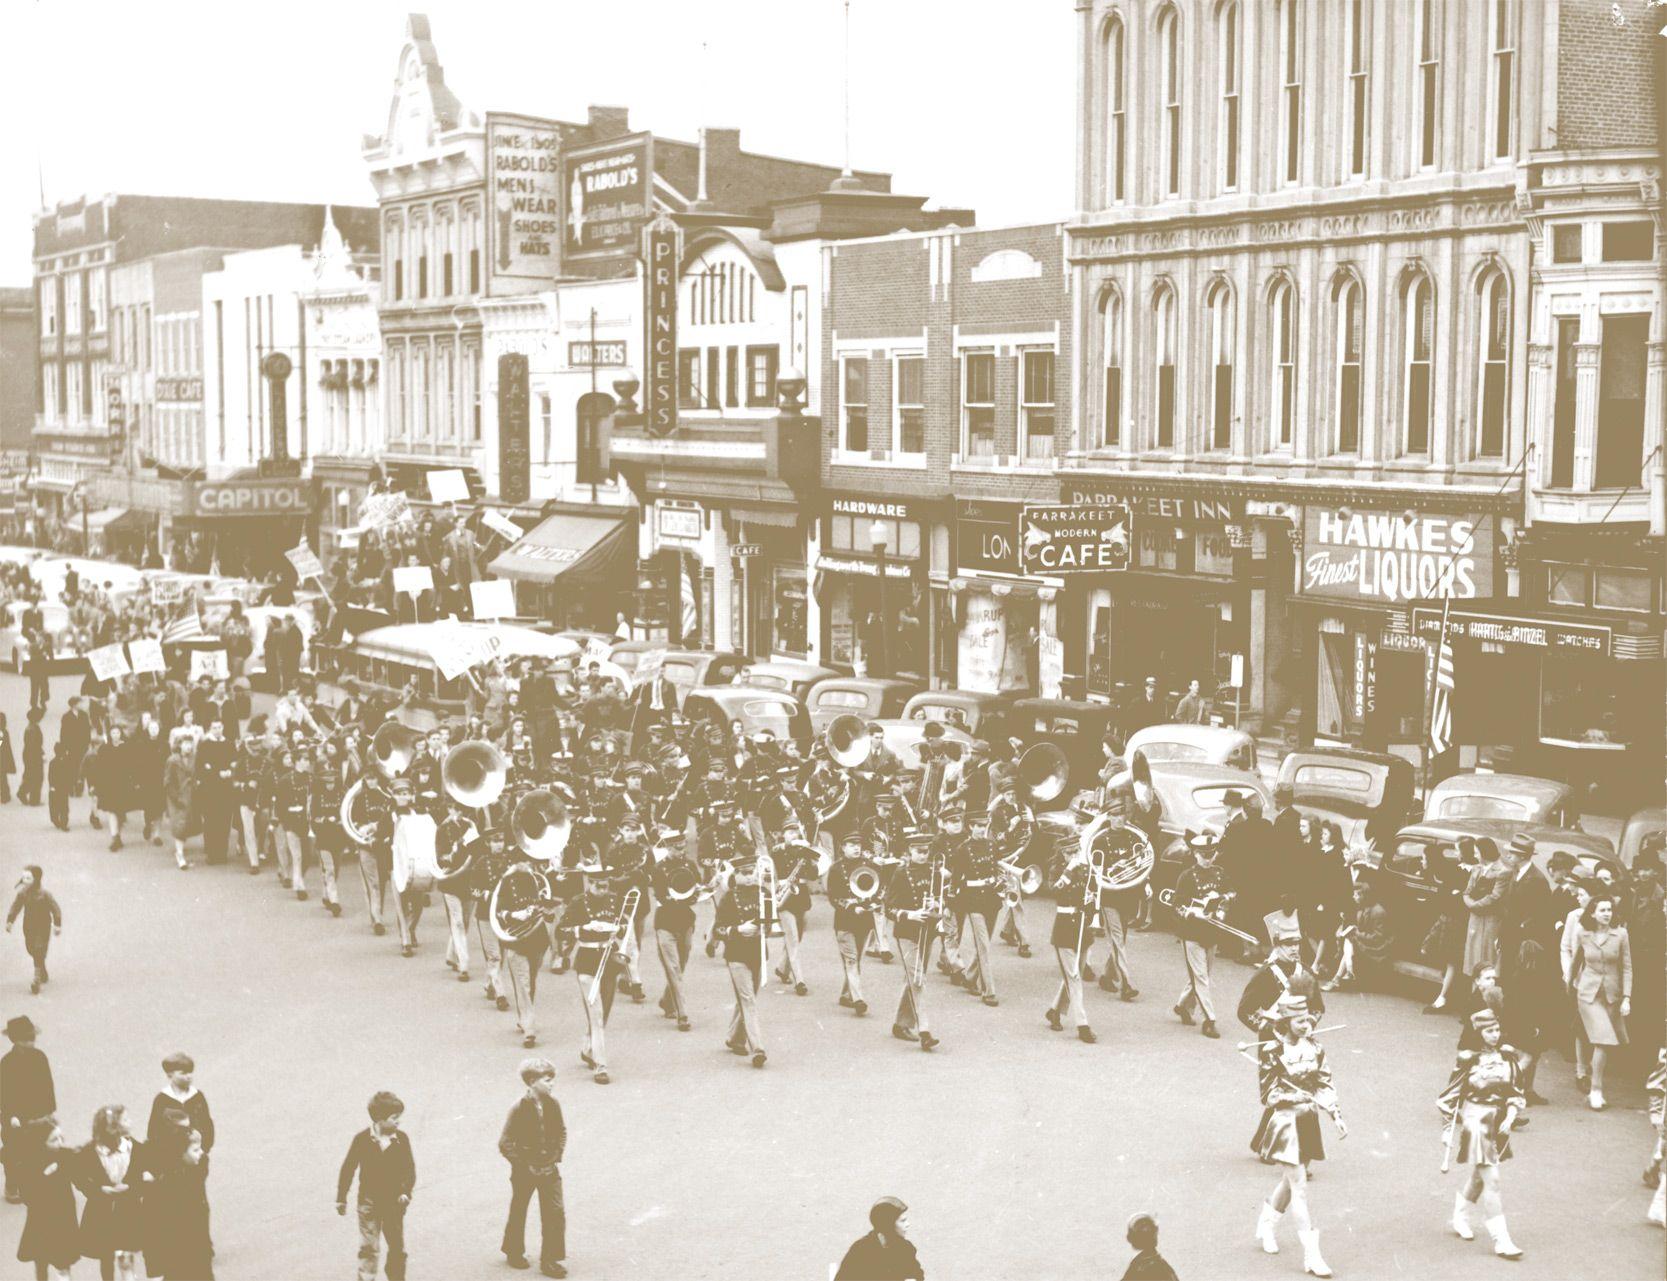 Homecoming Parade Through The Bg Downtown Square Wku Archives Homecoming Parade Homecoming Parades